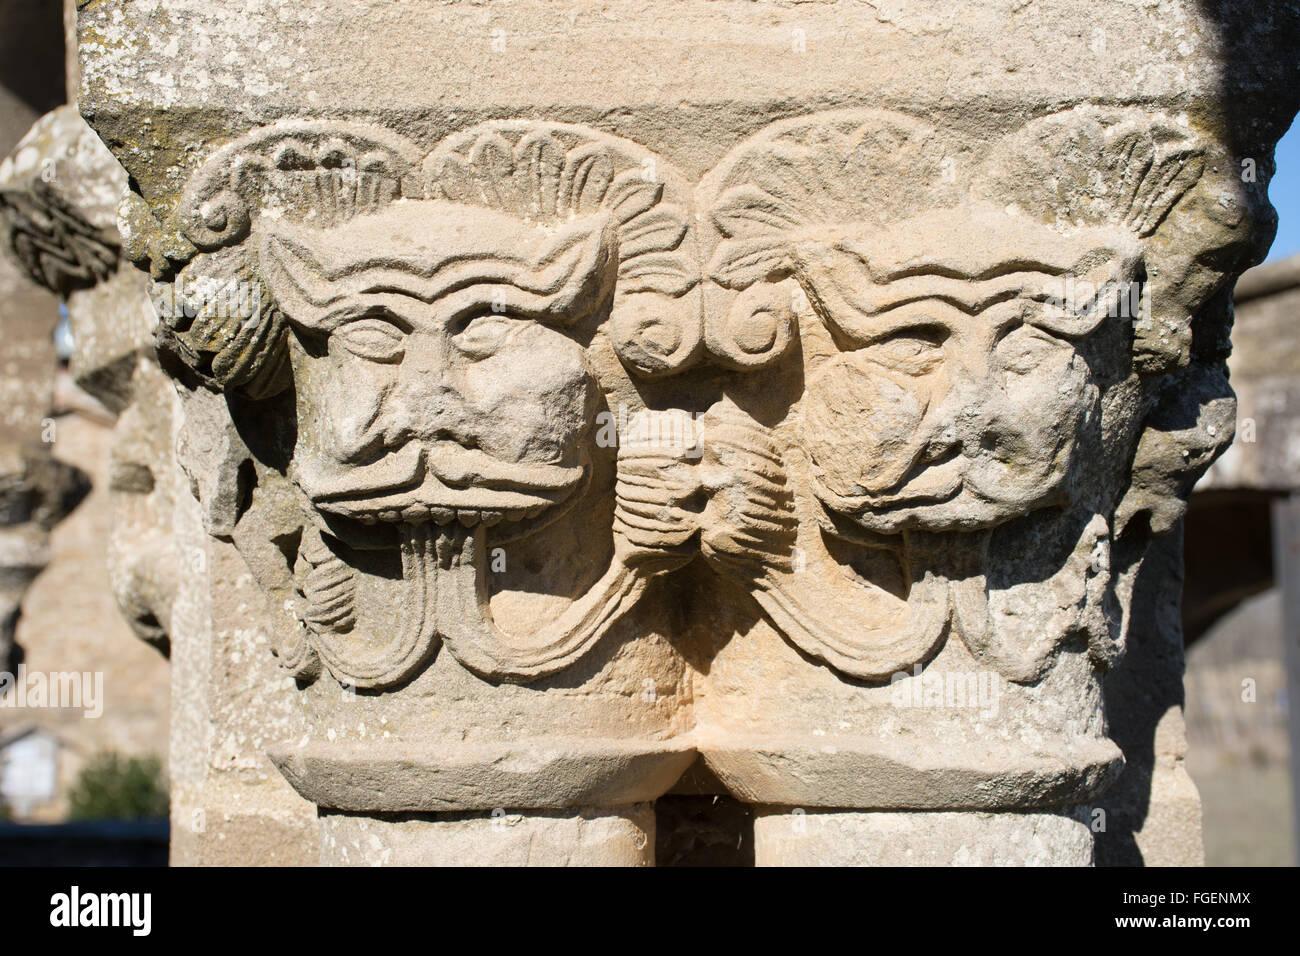 Capitals mythcal beasts Eunate Navarra Spain - Stock Image